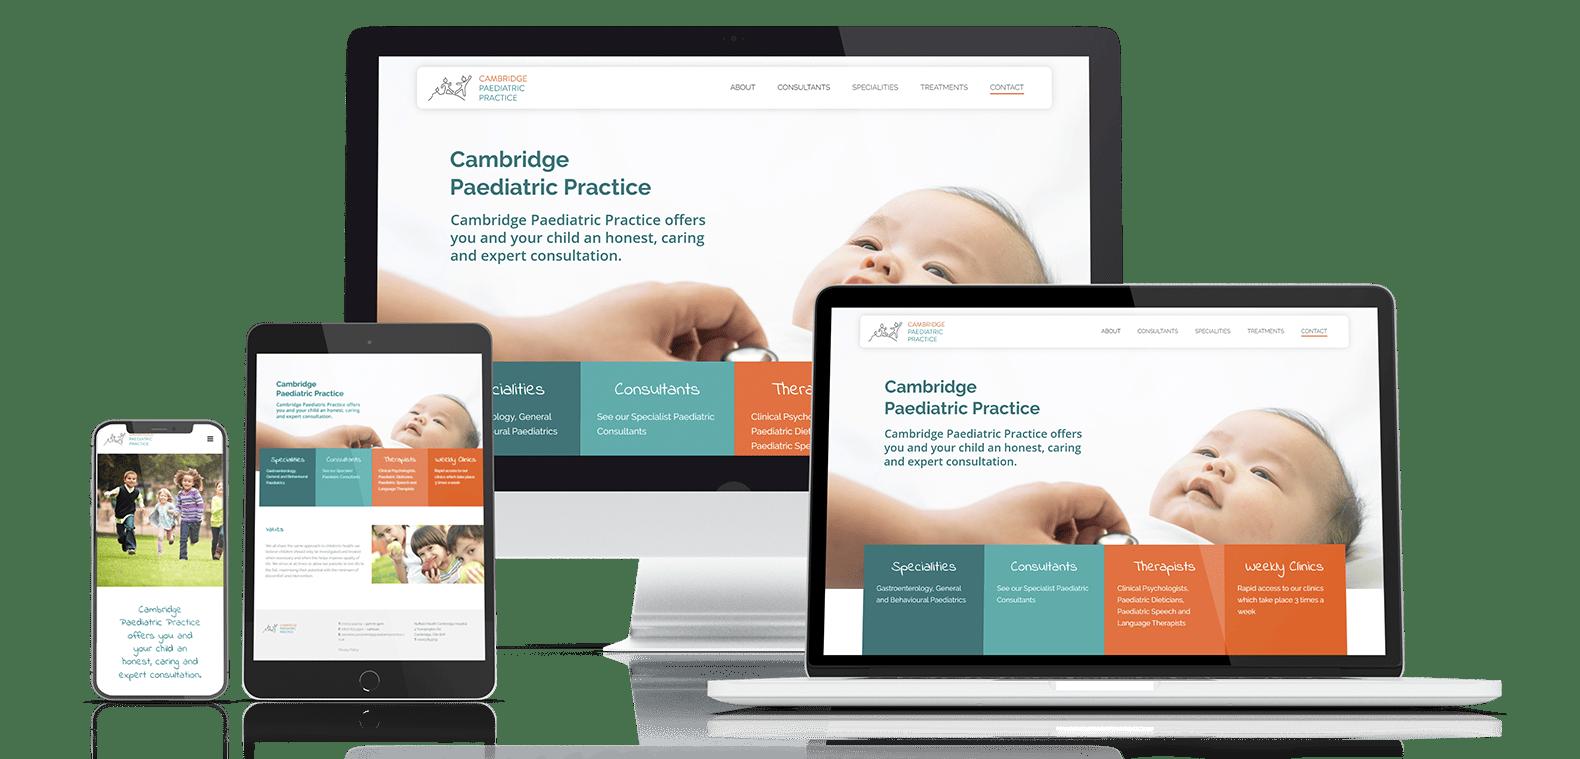 cambridge-paediatric